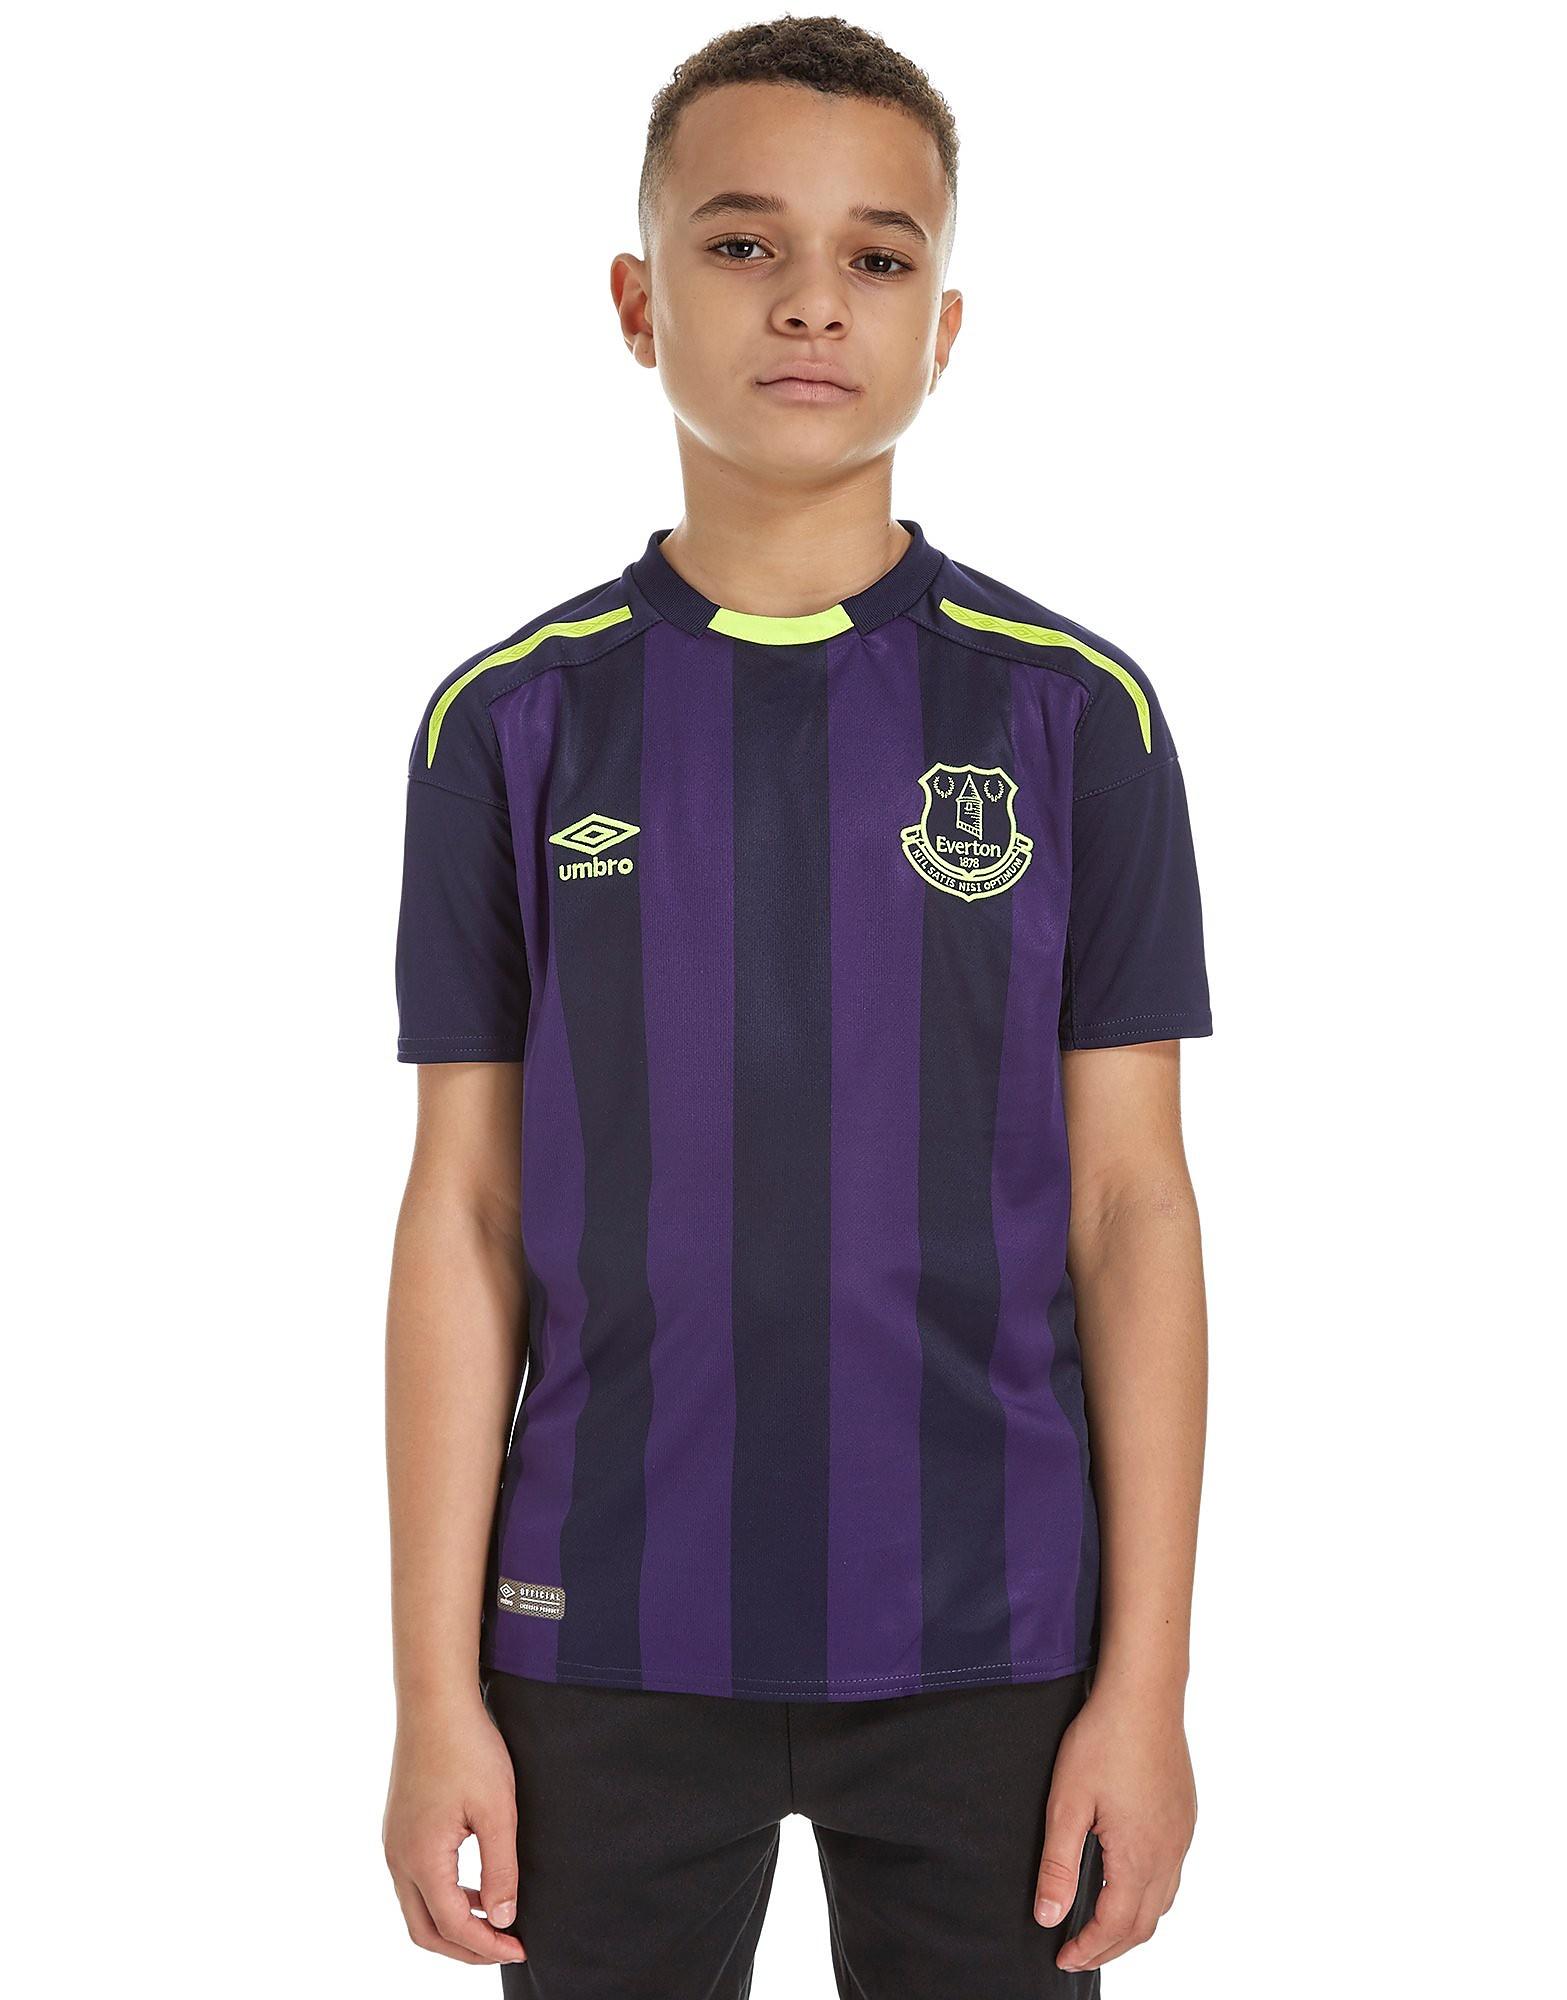 Umbro Everton FC 2017/18 Third Shirt Junior